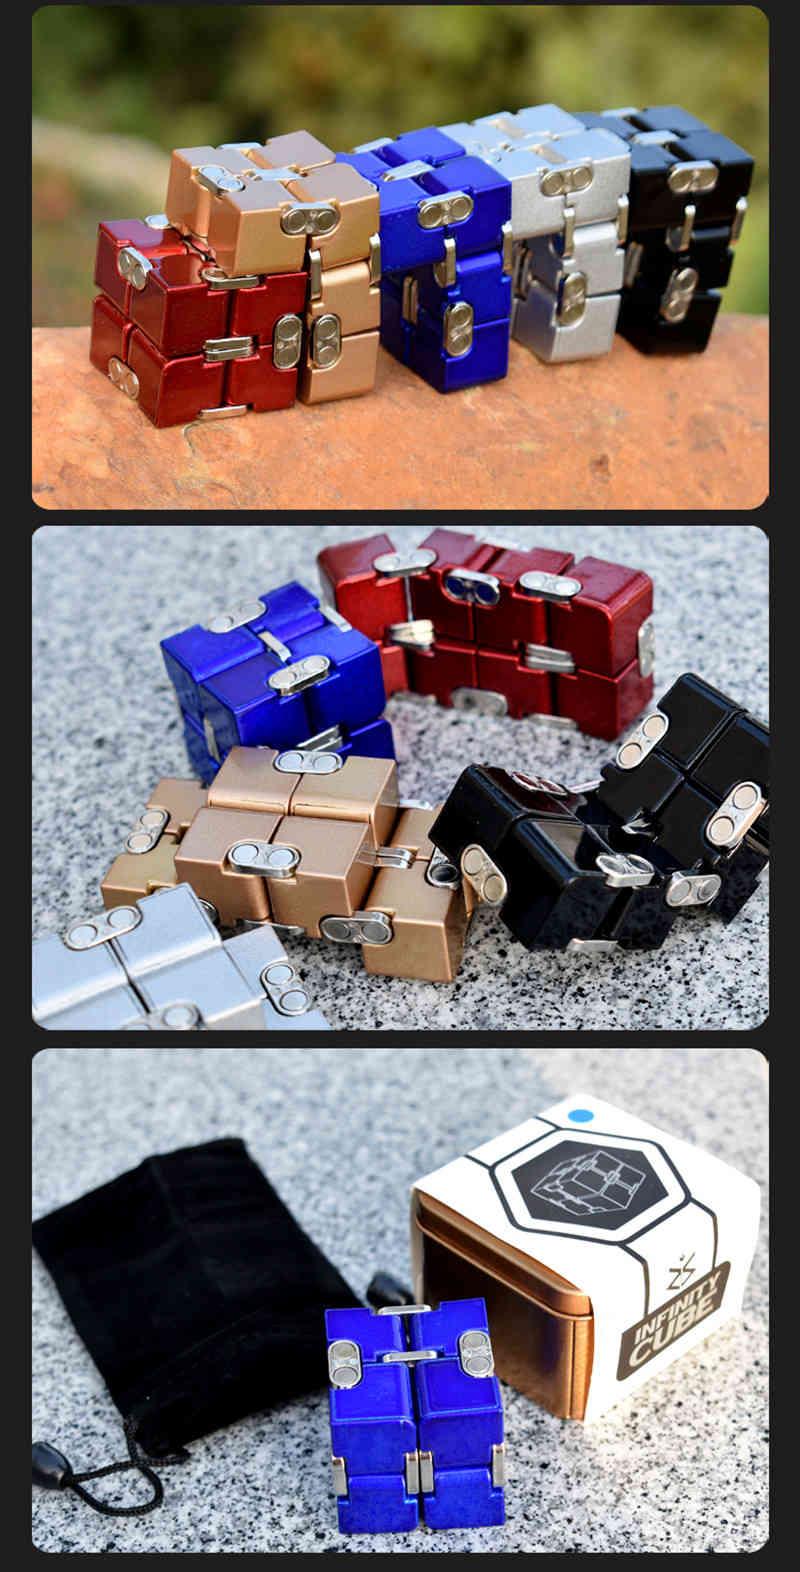 Infinity Cube Fidget Toy (12)